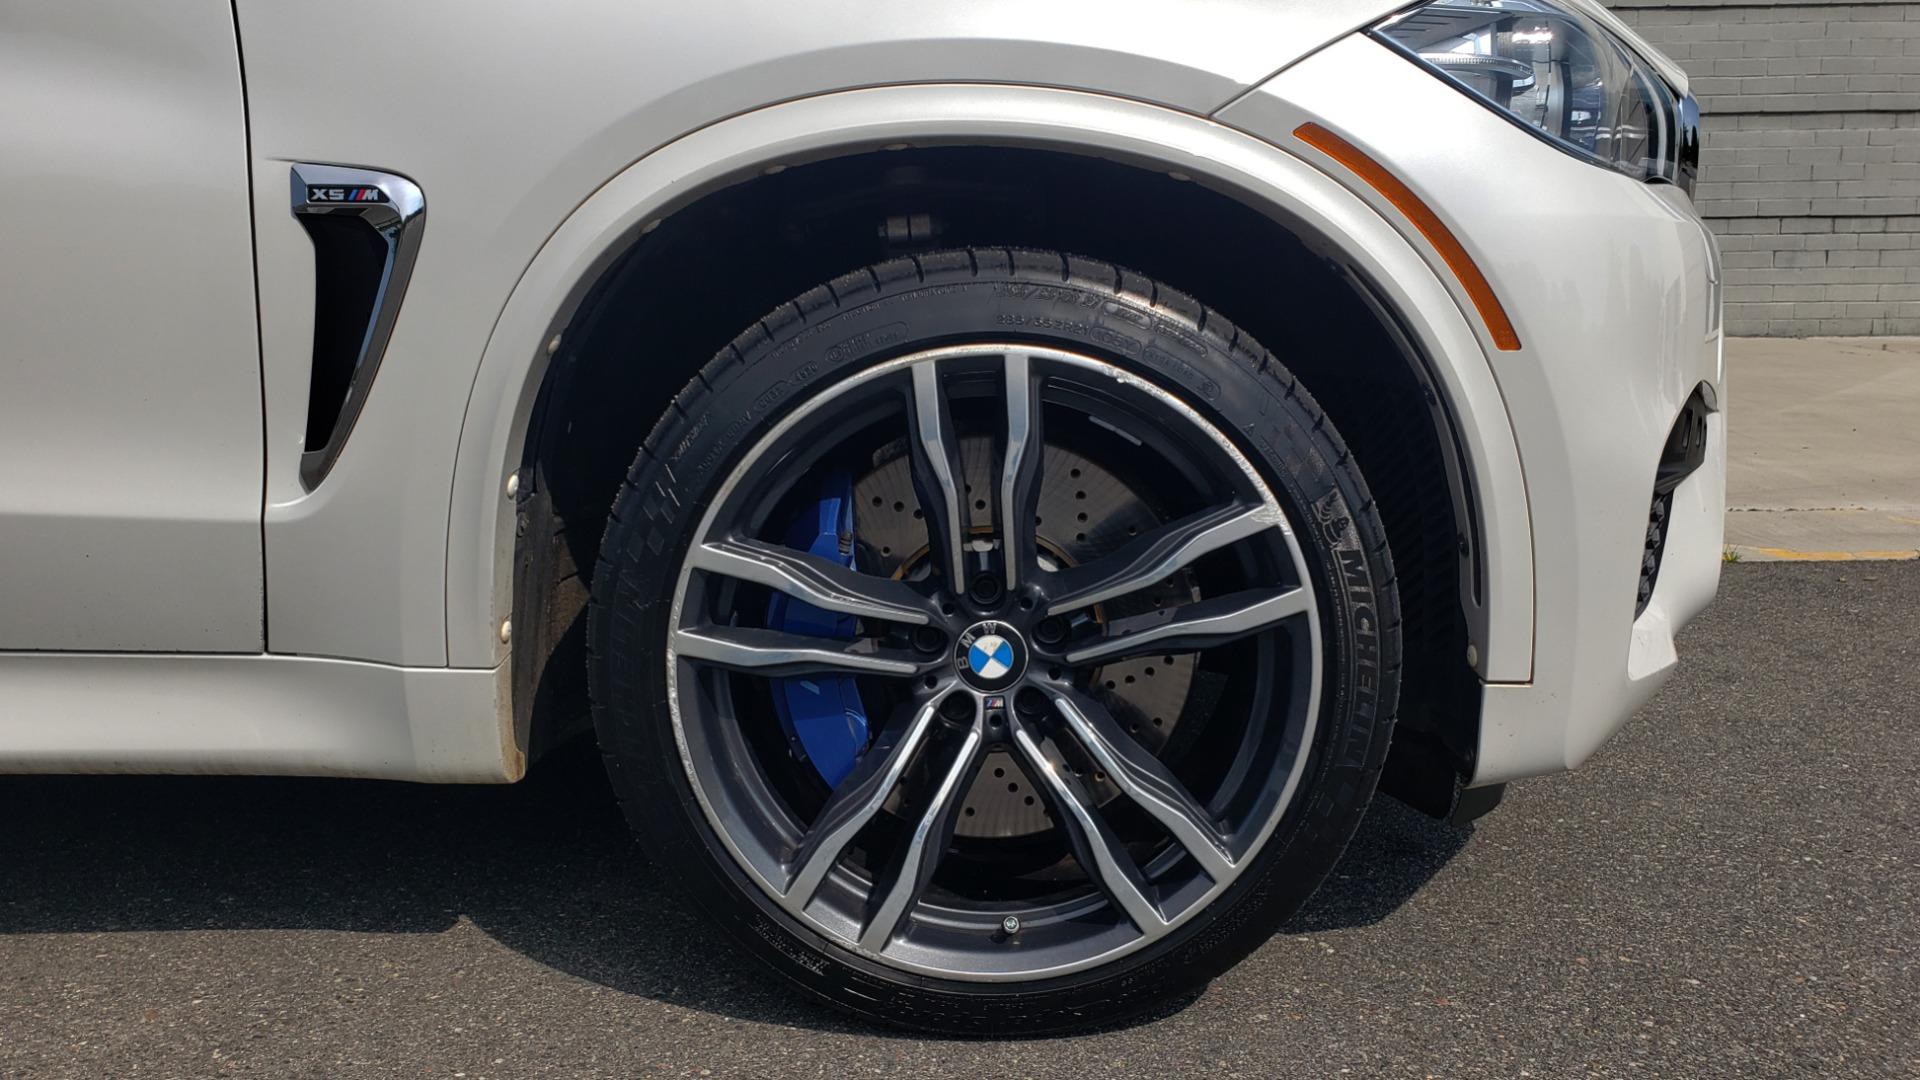 Used 2017 BMW X5 M EXECUTIVE PKG / NAV / DRVR ASST / BSM / HUD / HTD STS / WIFI for sale Sold at Formula Imports in Charlotte NC 28227 88